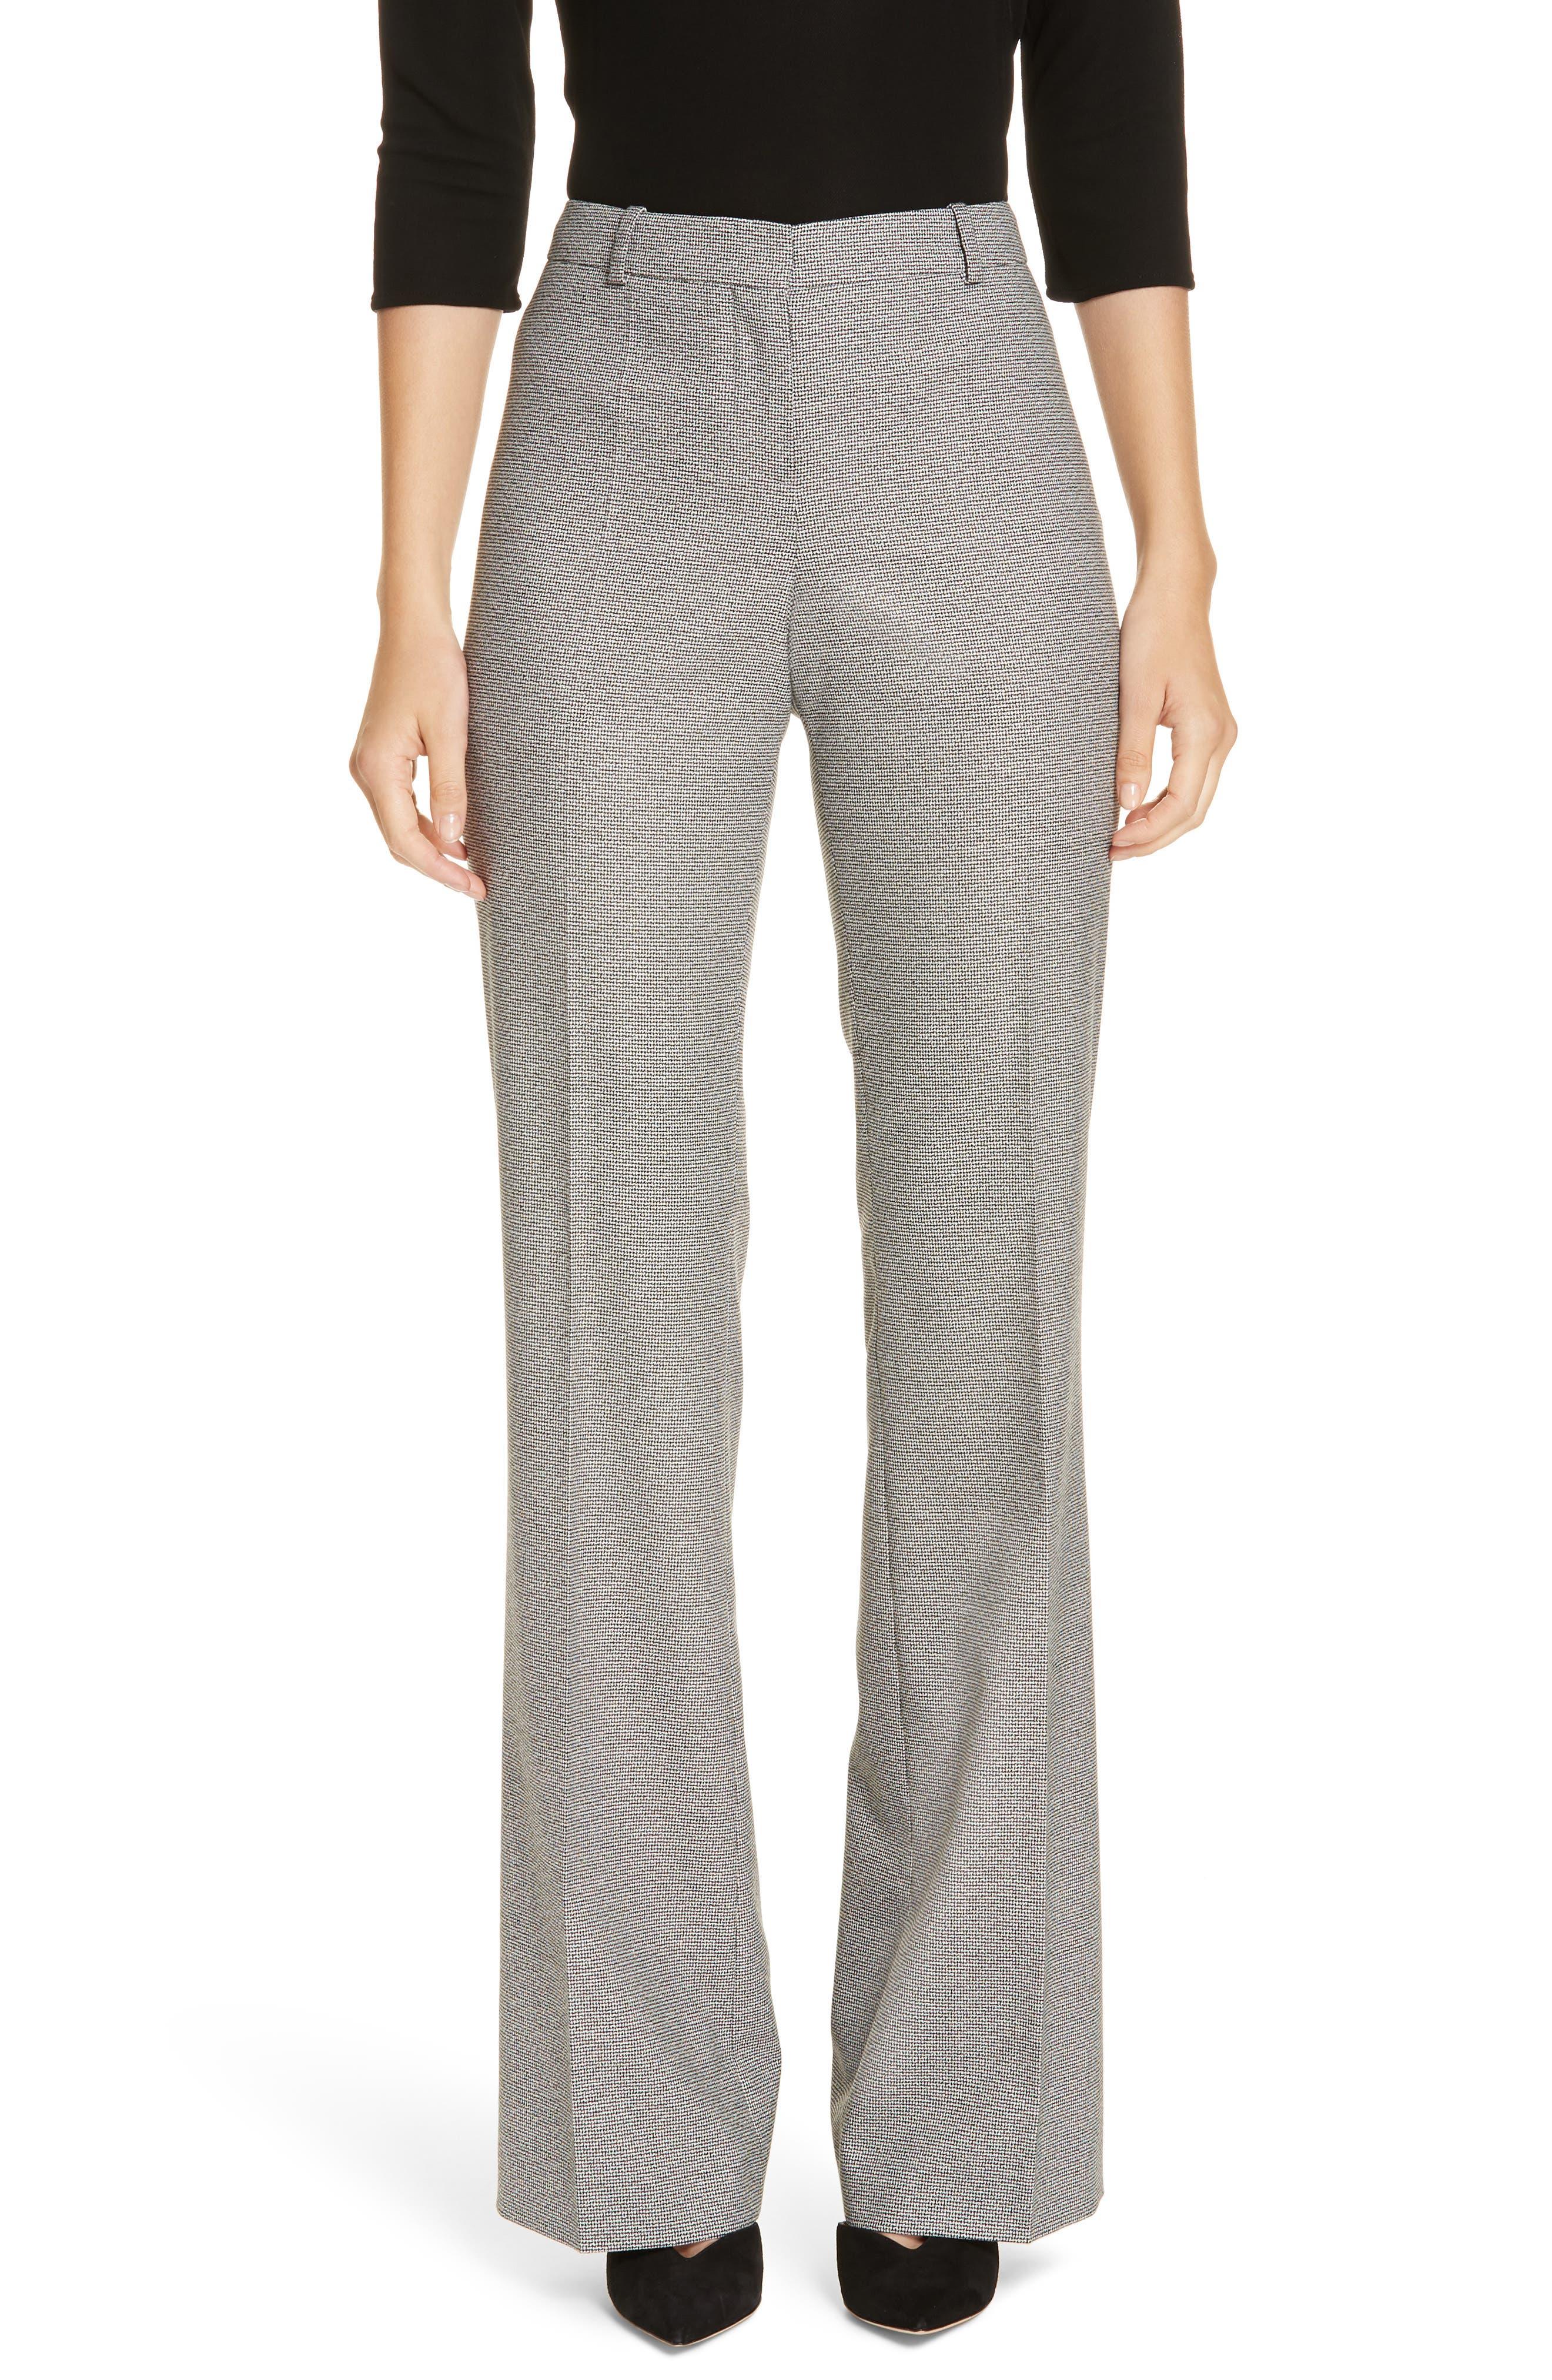 Tulea Blurred Optic Wool Suiting Trousers,                             Main thumbnail 1, color,                             BLACK FANTASY